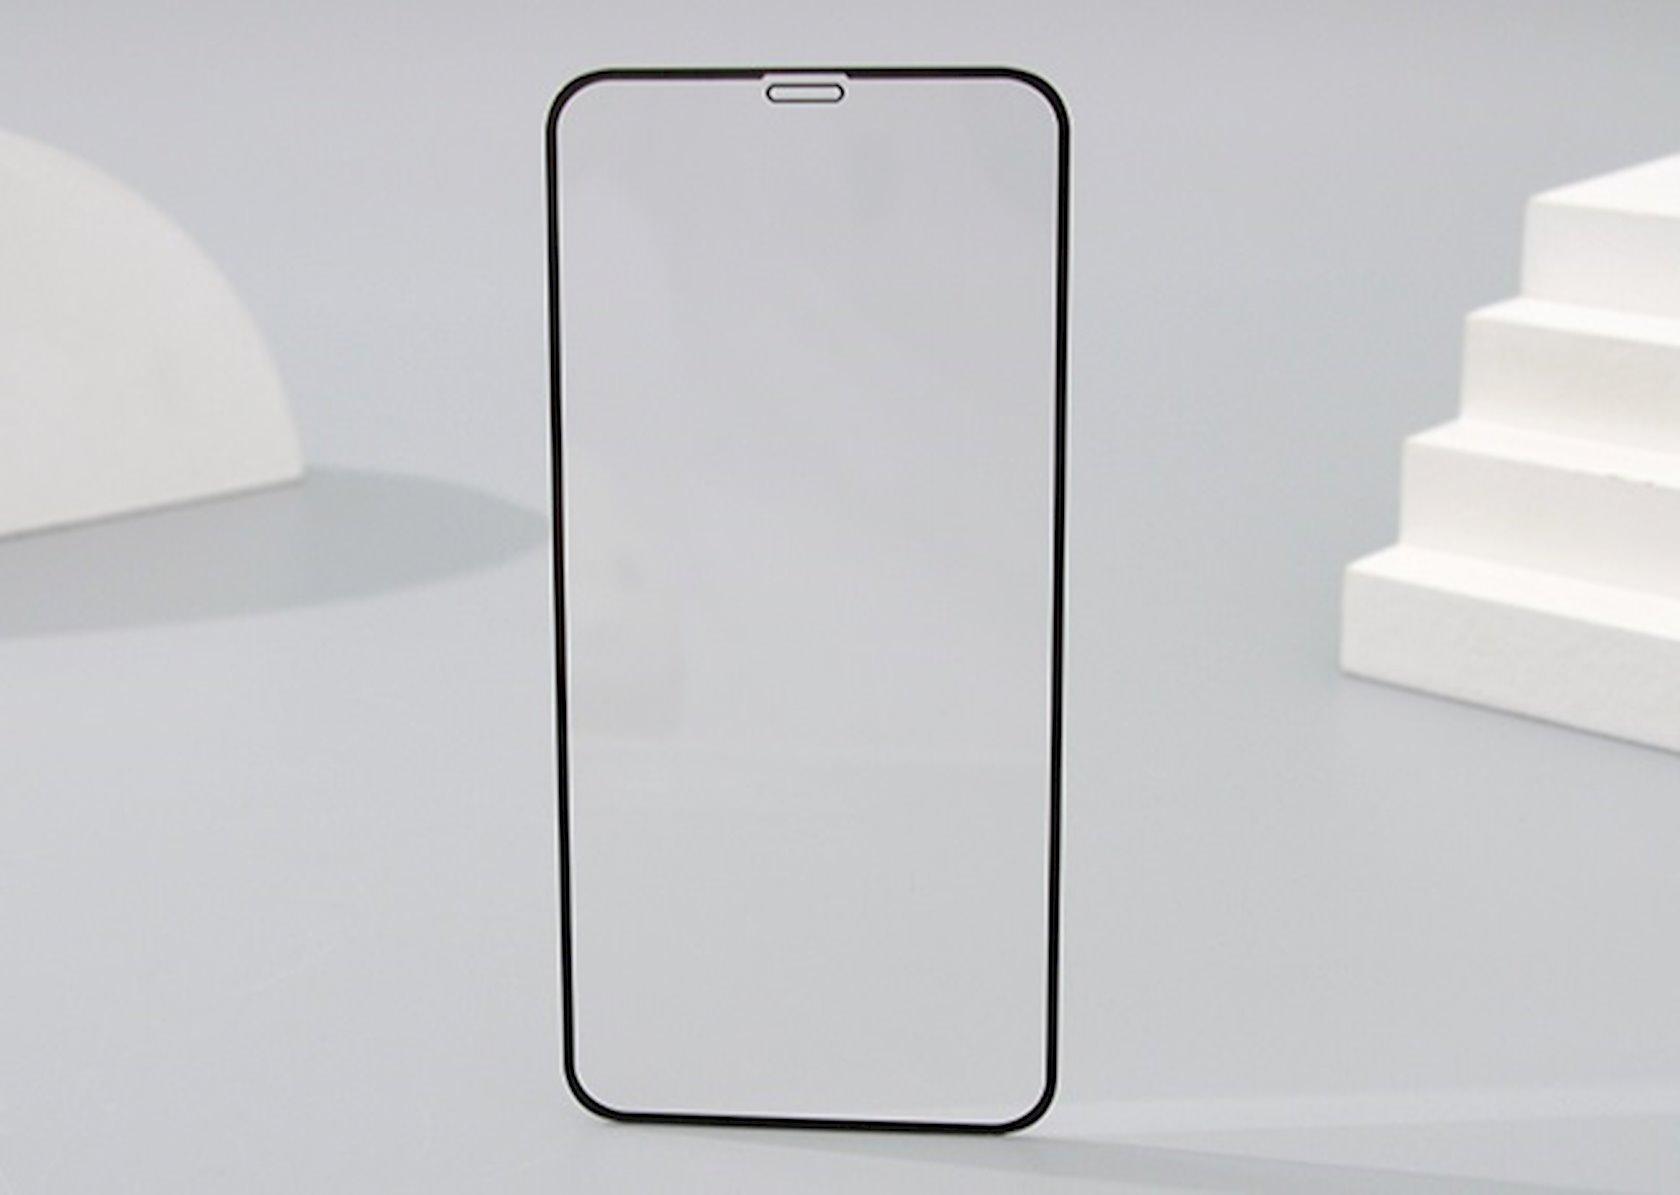 Qoruyucu şüşə Ximivogue Full Screen Tempered Glass Screen Protector Apple iPhone 11 Pro üçün